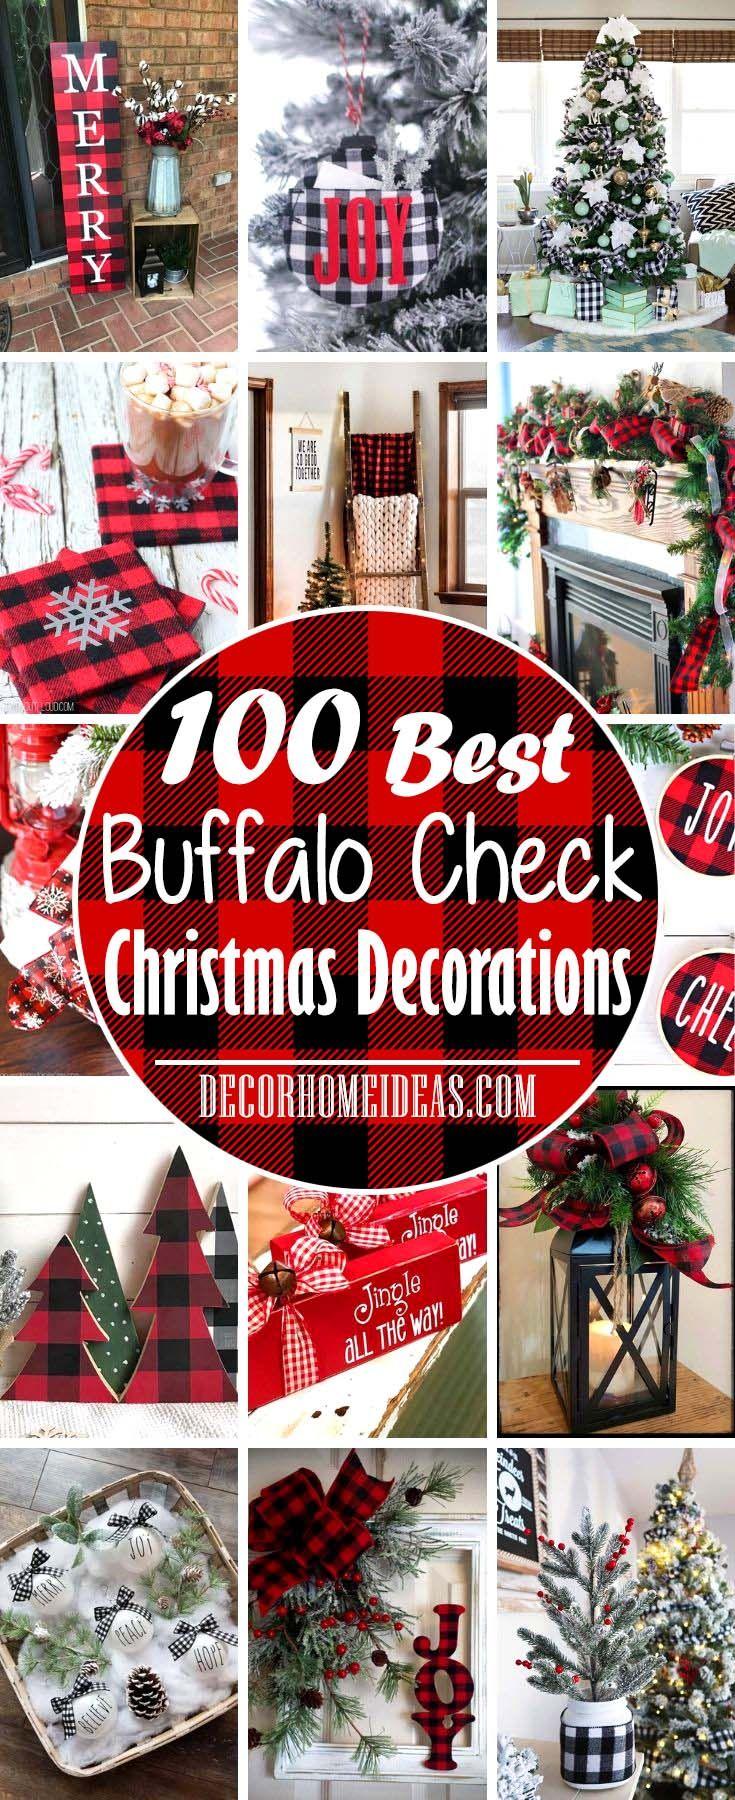 100 Best Diy Buffalo Check Christmas Decor Ideas Buffalo Check Christmas Decor Buffalo Plaid Christmas Decor Buffalo Check Christmas